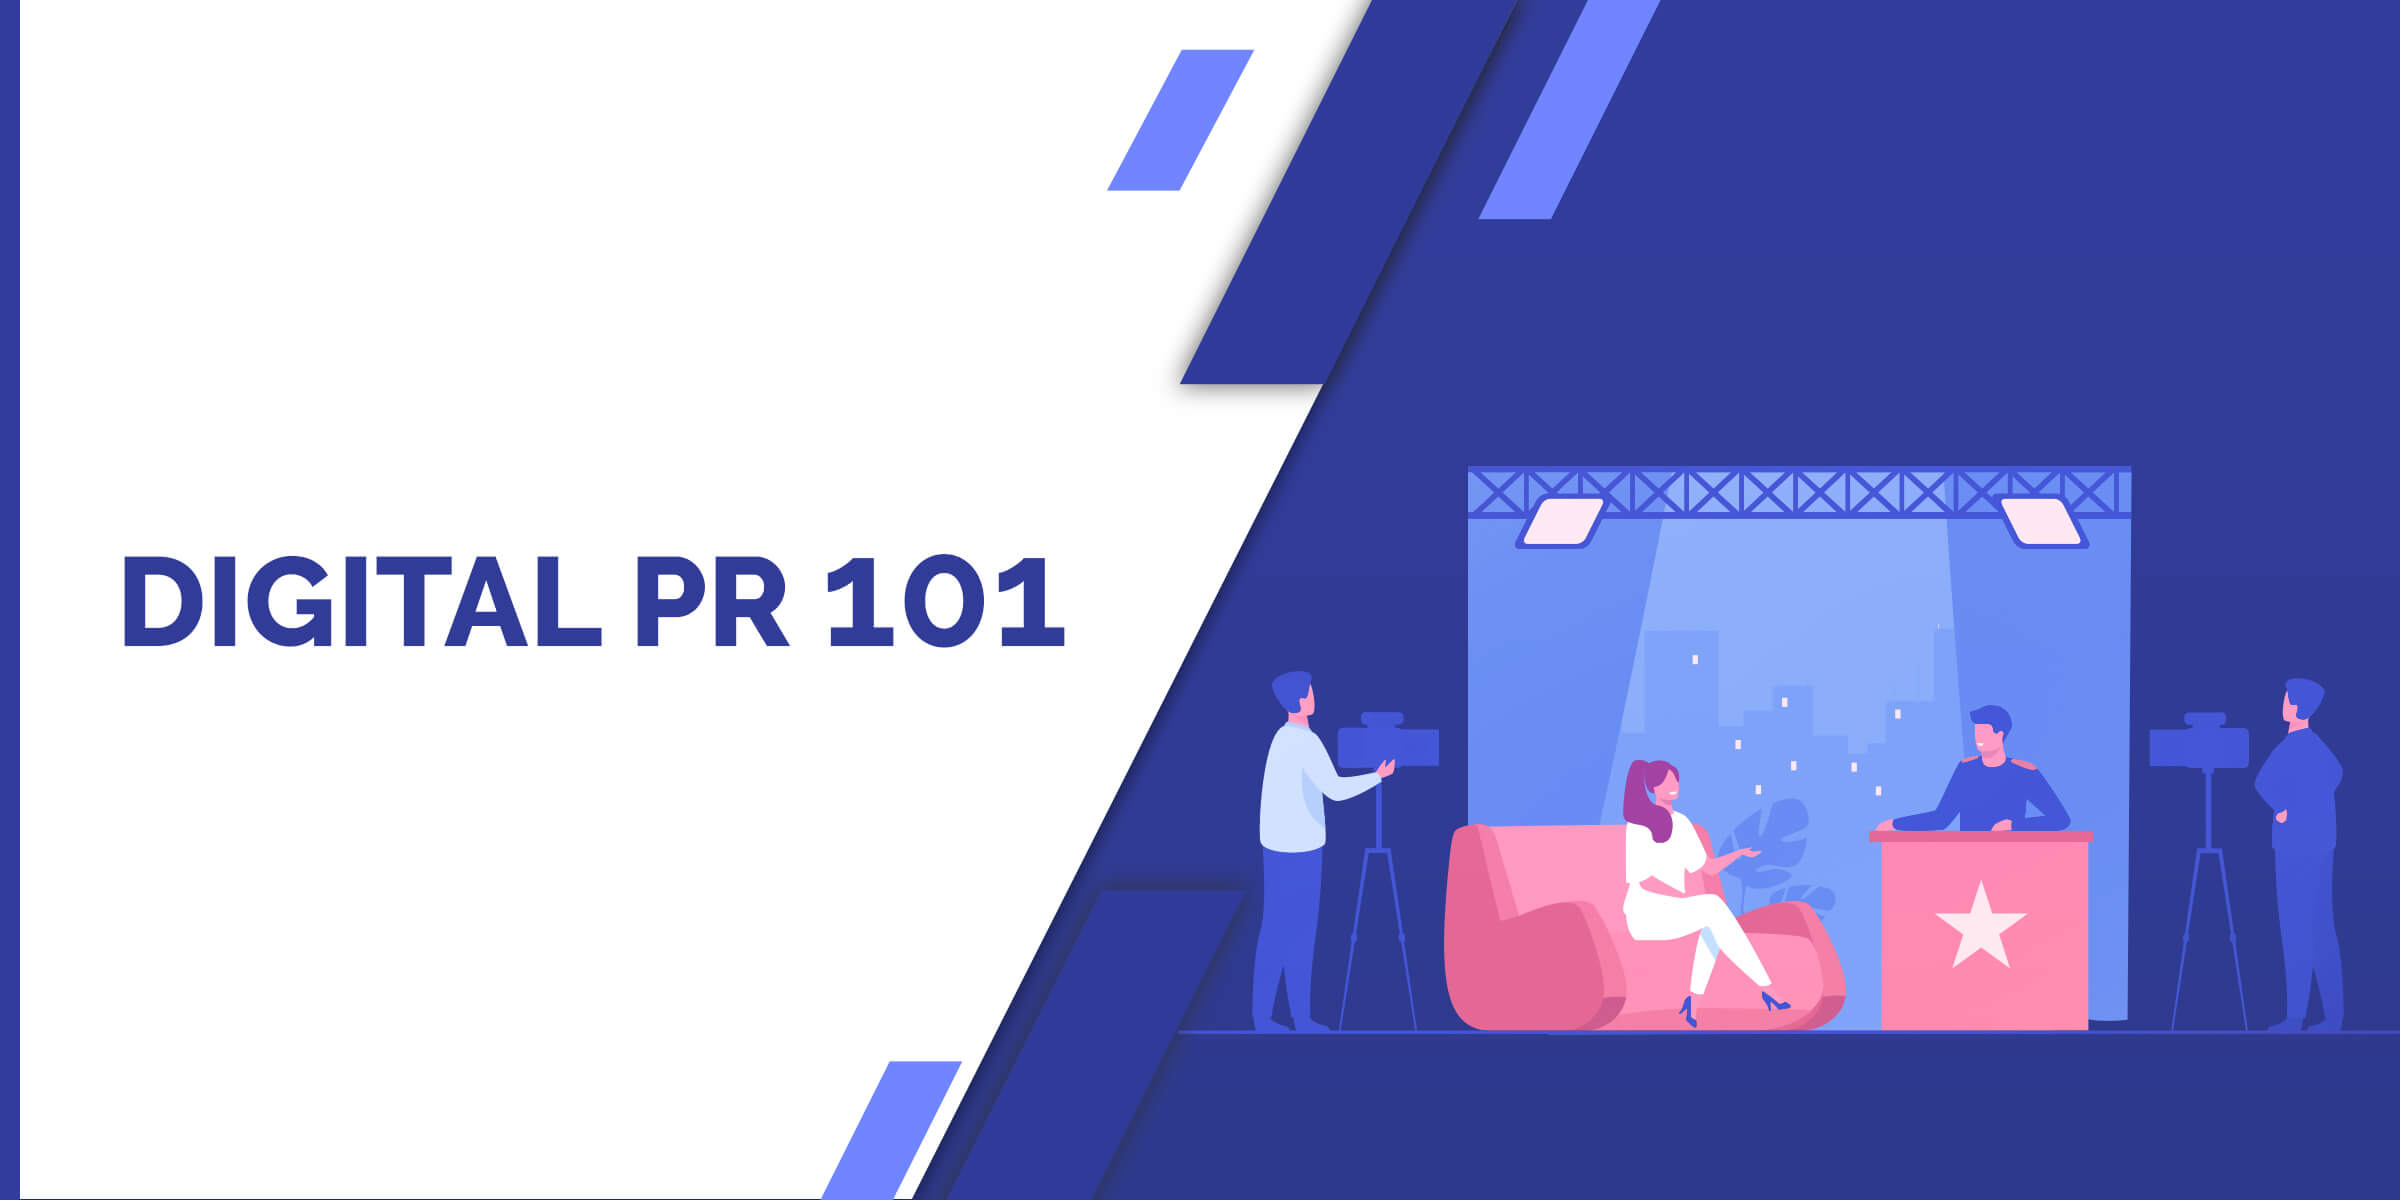 Digital PR 101 - Introduction to Digital PR